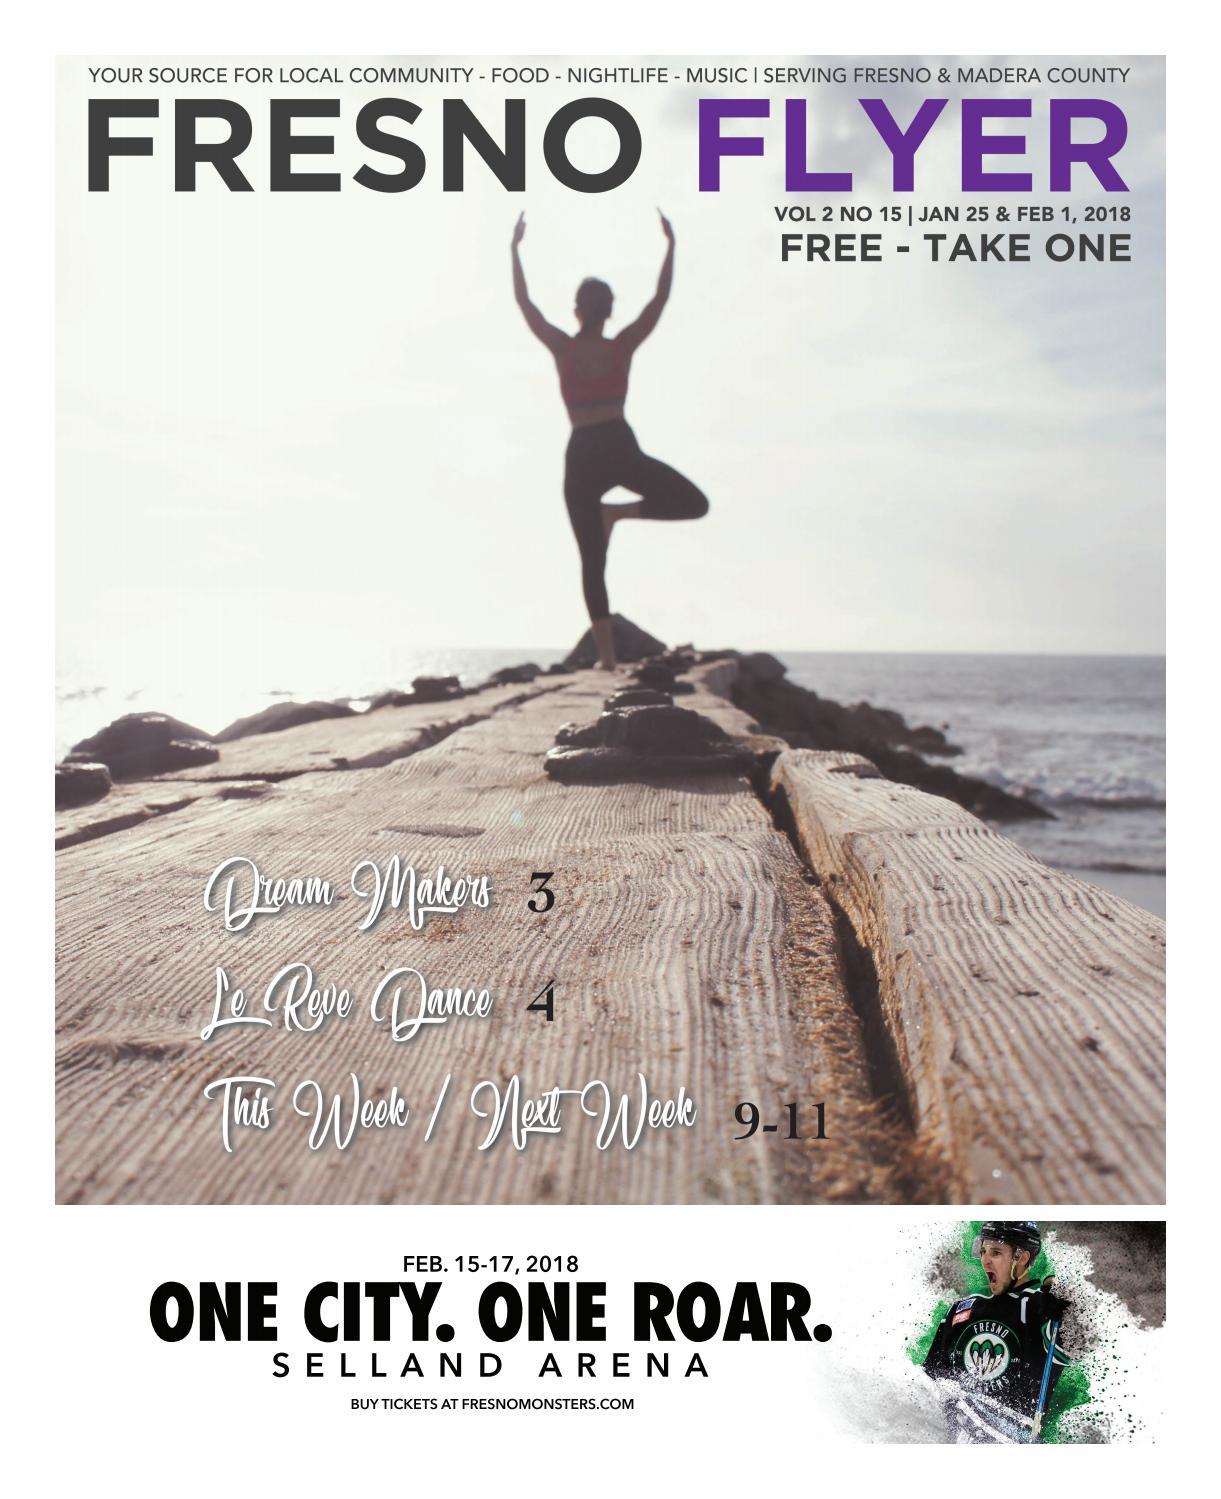 a9d16b6a6d Fresno Flyer Vol 2 No 15 by Fresno Flyer - issuu